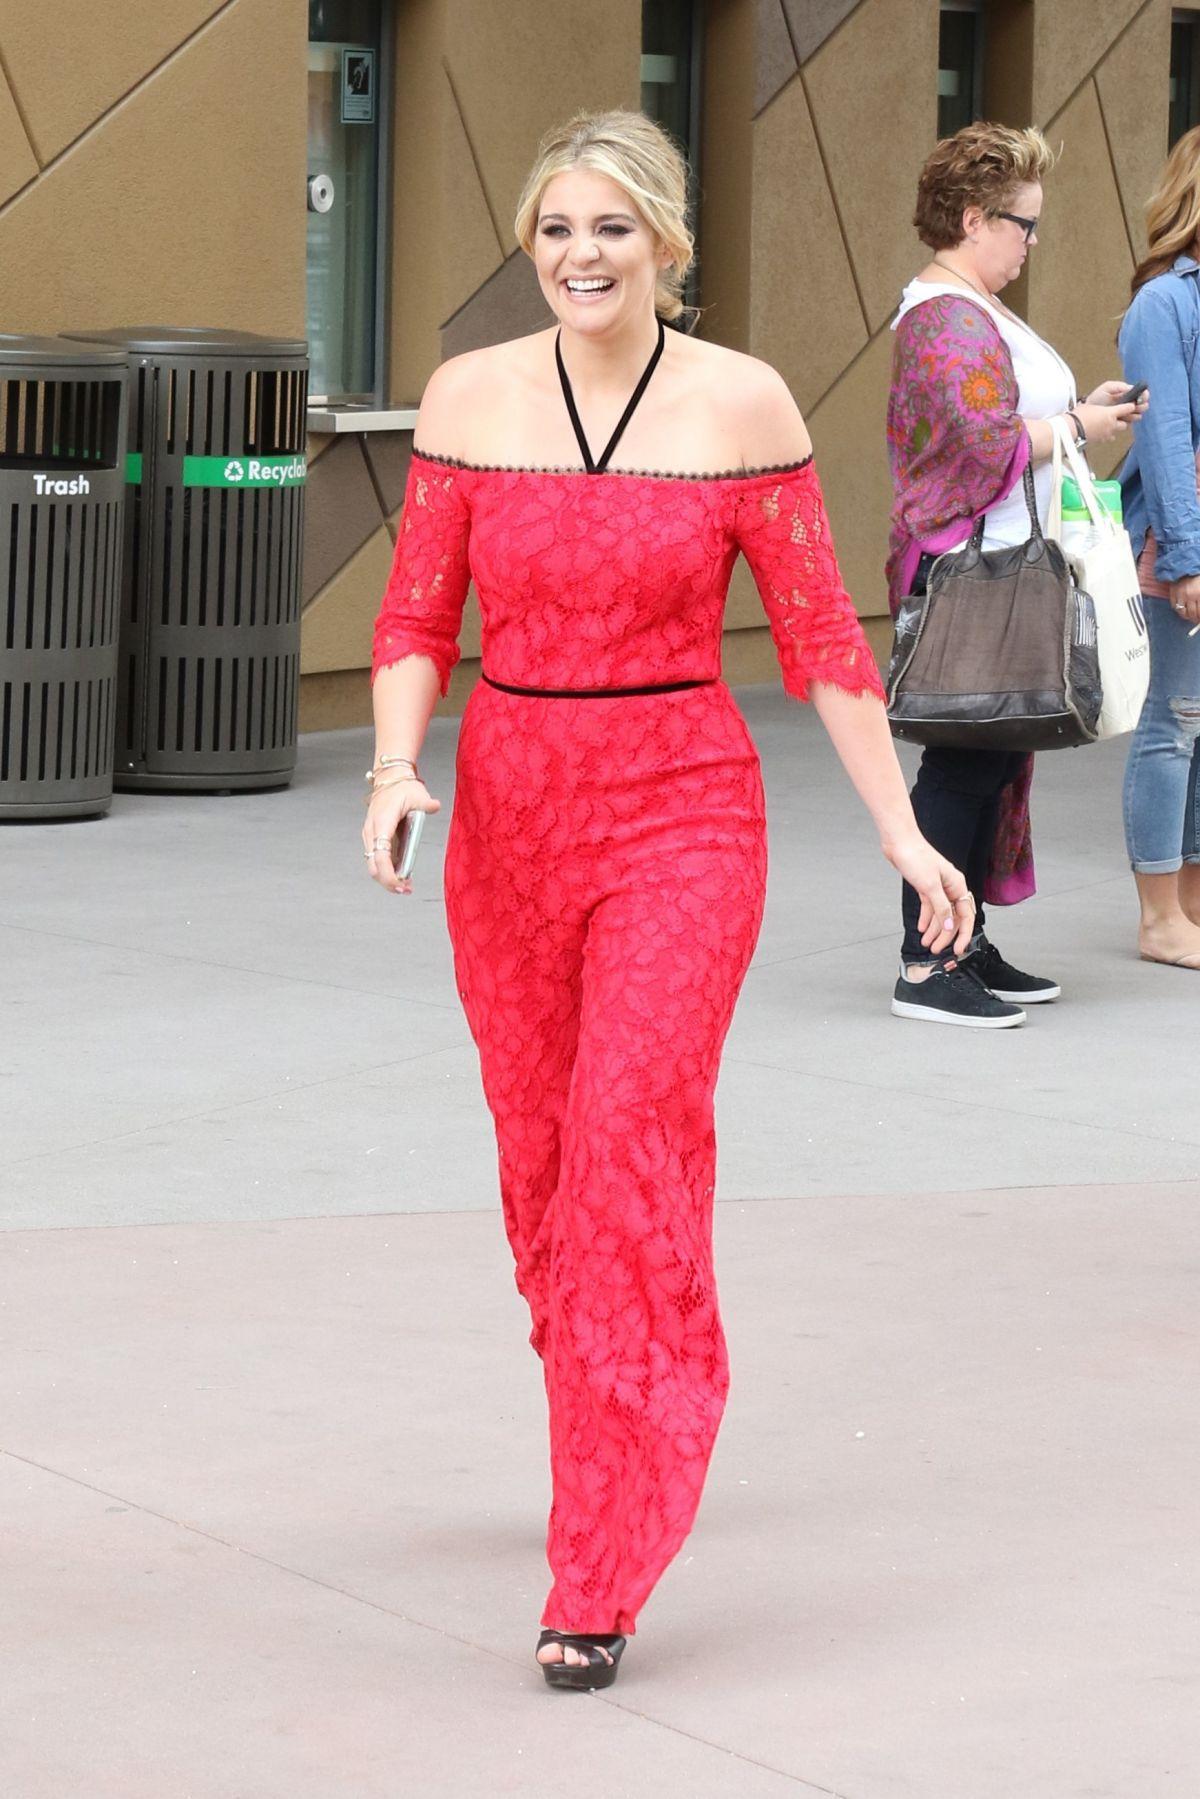 LAUREN ALAINA Arrives at T-Mobile Arena in Las Vegas 03/31/2017